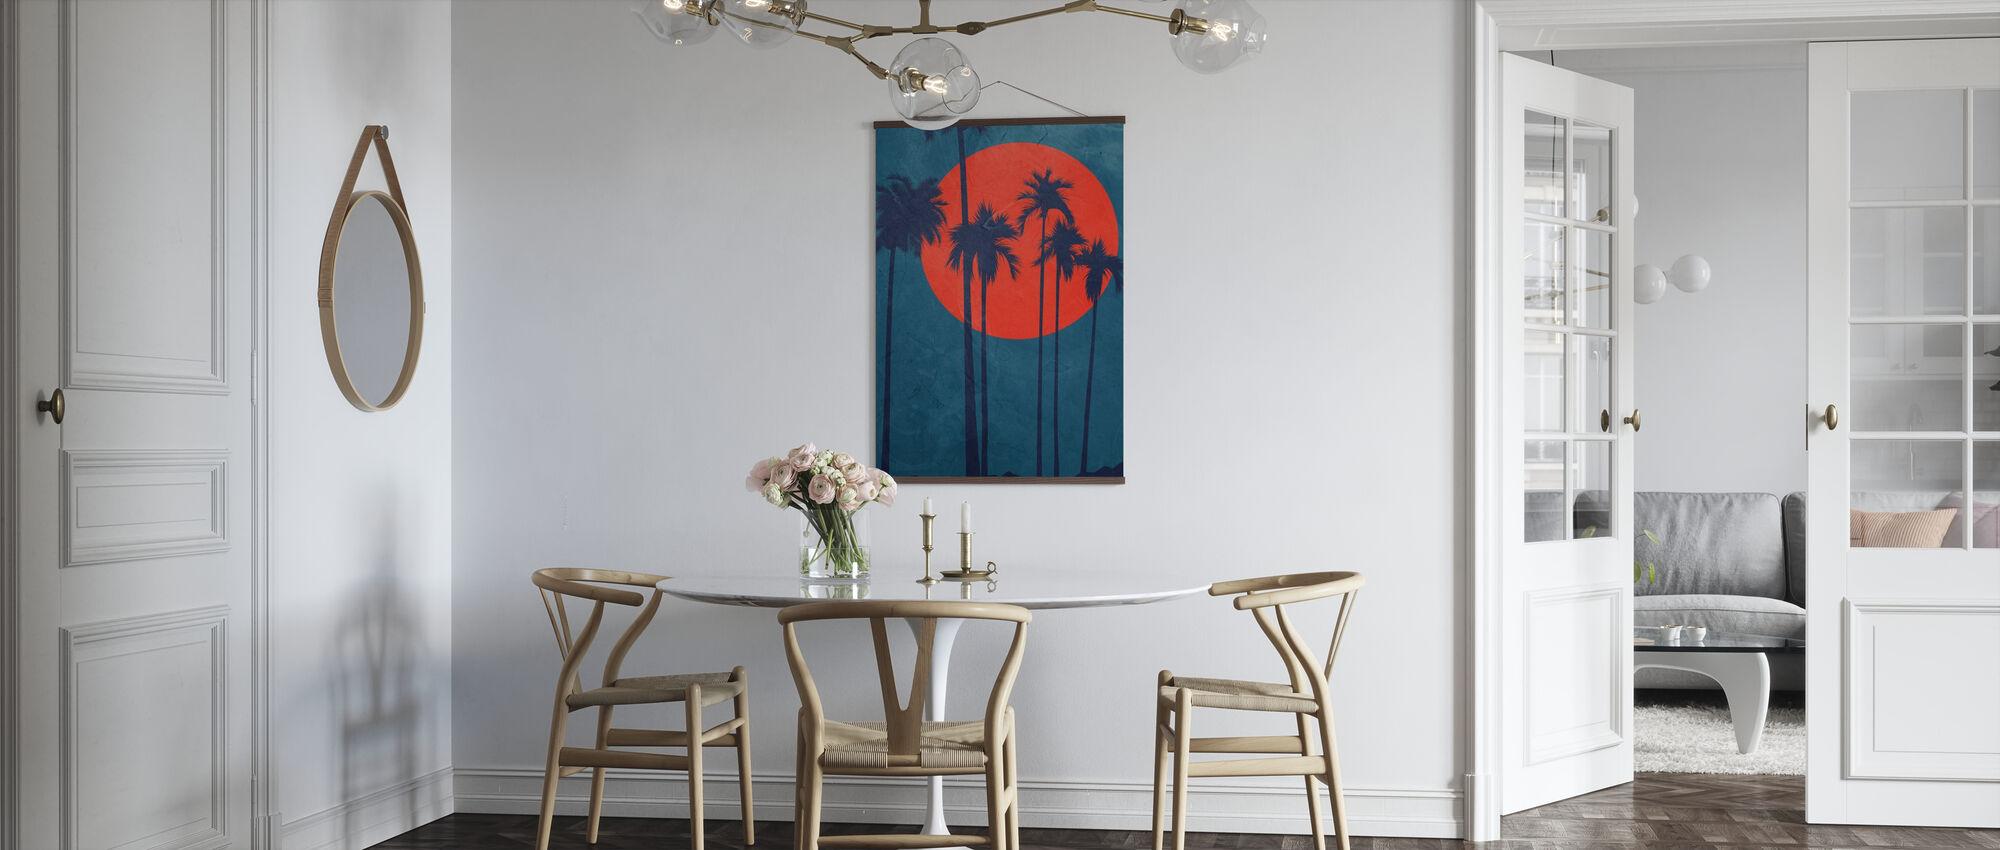 Cote d Azur - Poster - Kök